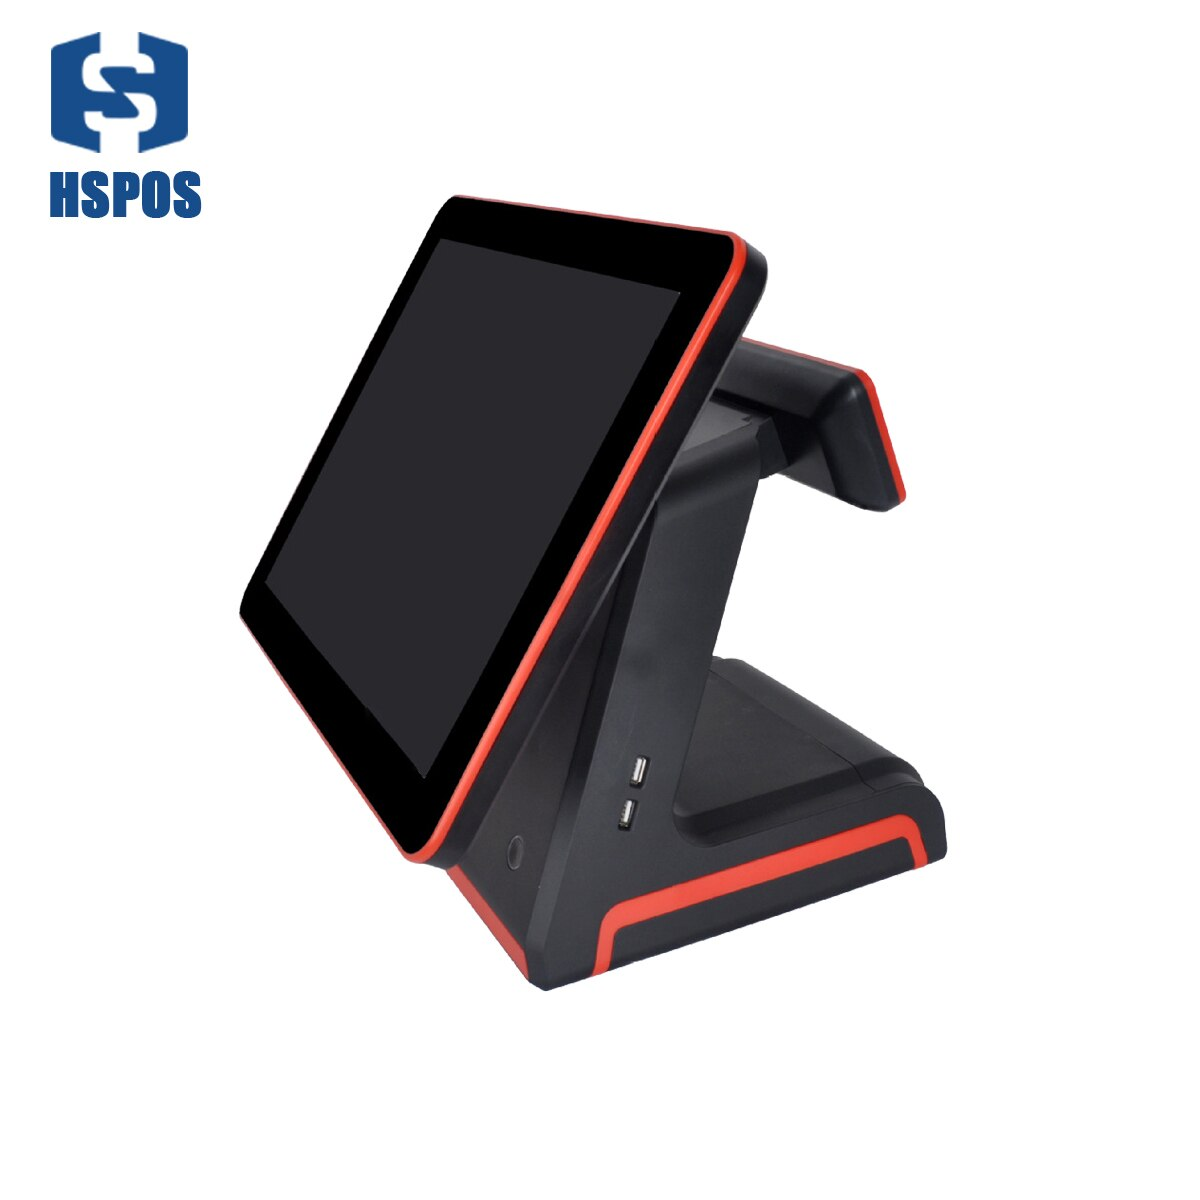 Pantalla LCD, monitor de pantalla táctil, compatible con una pantalla única de 15,6 pulgadas para restaurante cafetería